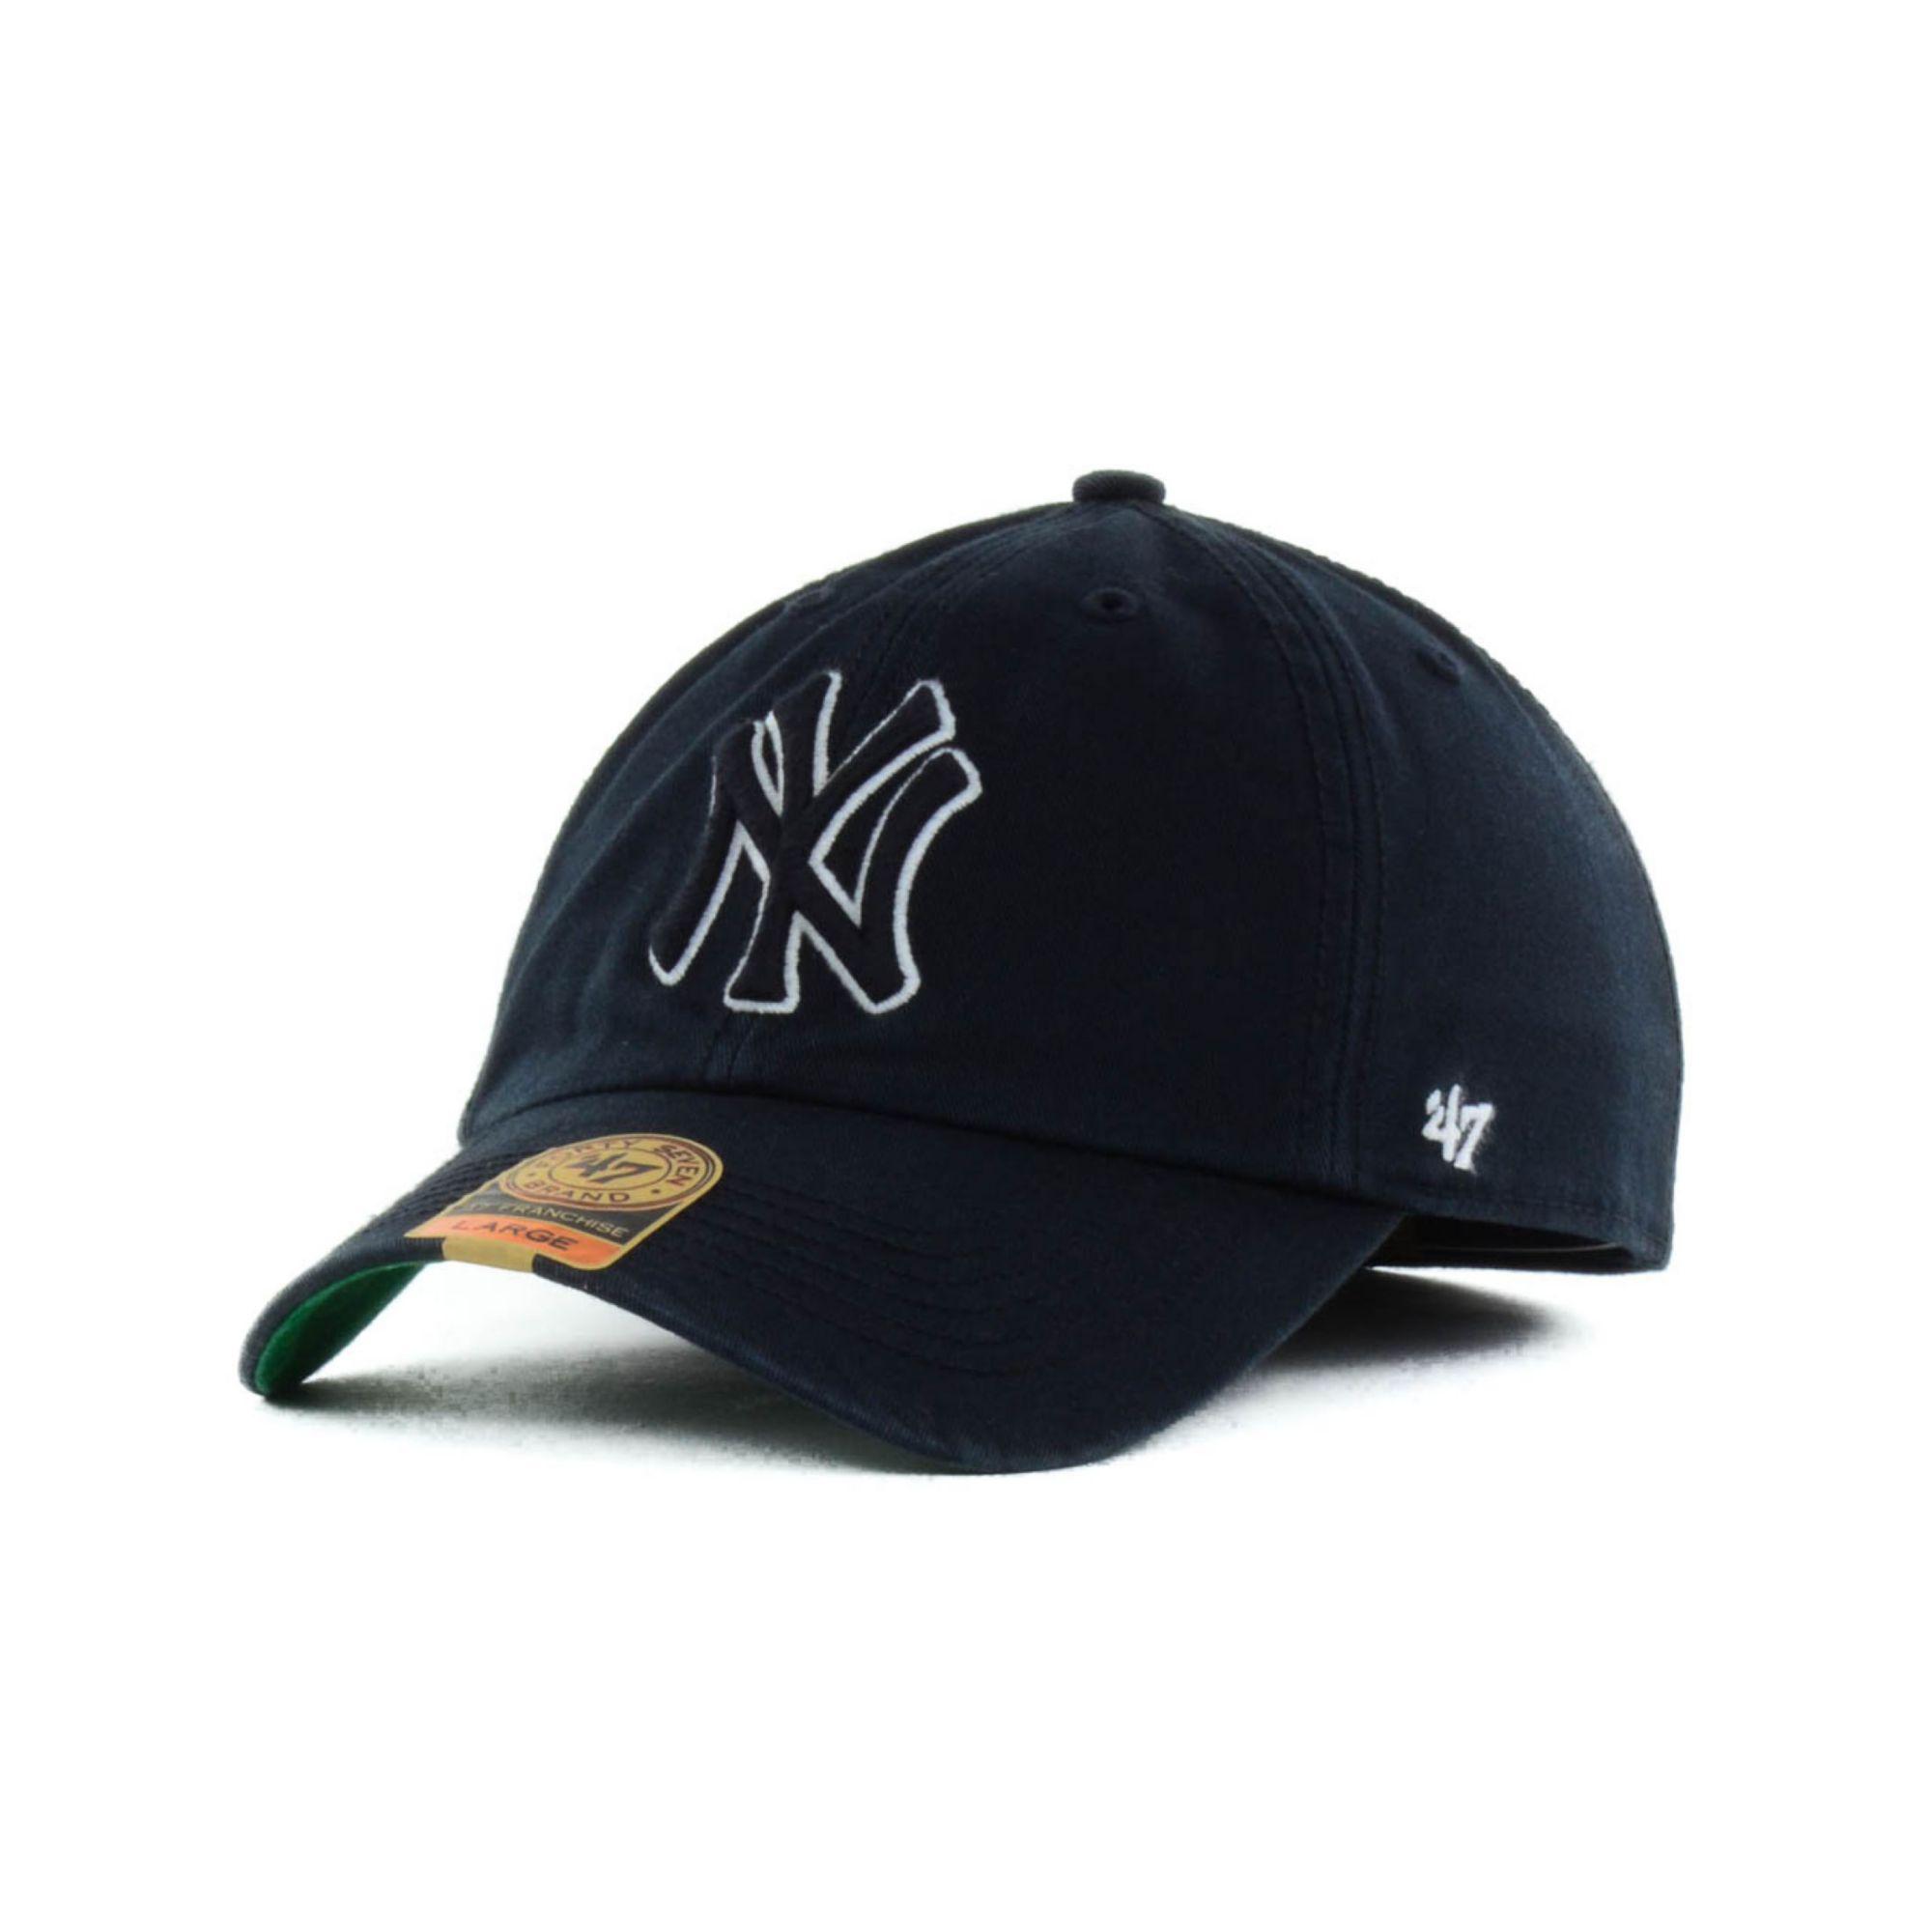 47 brand new york yankees black out franchise cap in black. Black Bedroom Furniture Sets. Home Design Ideas